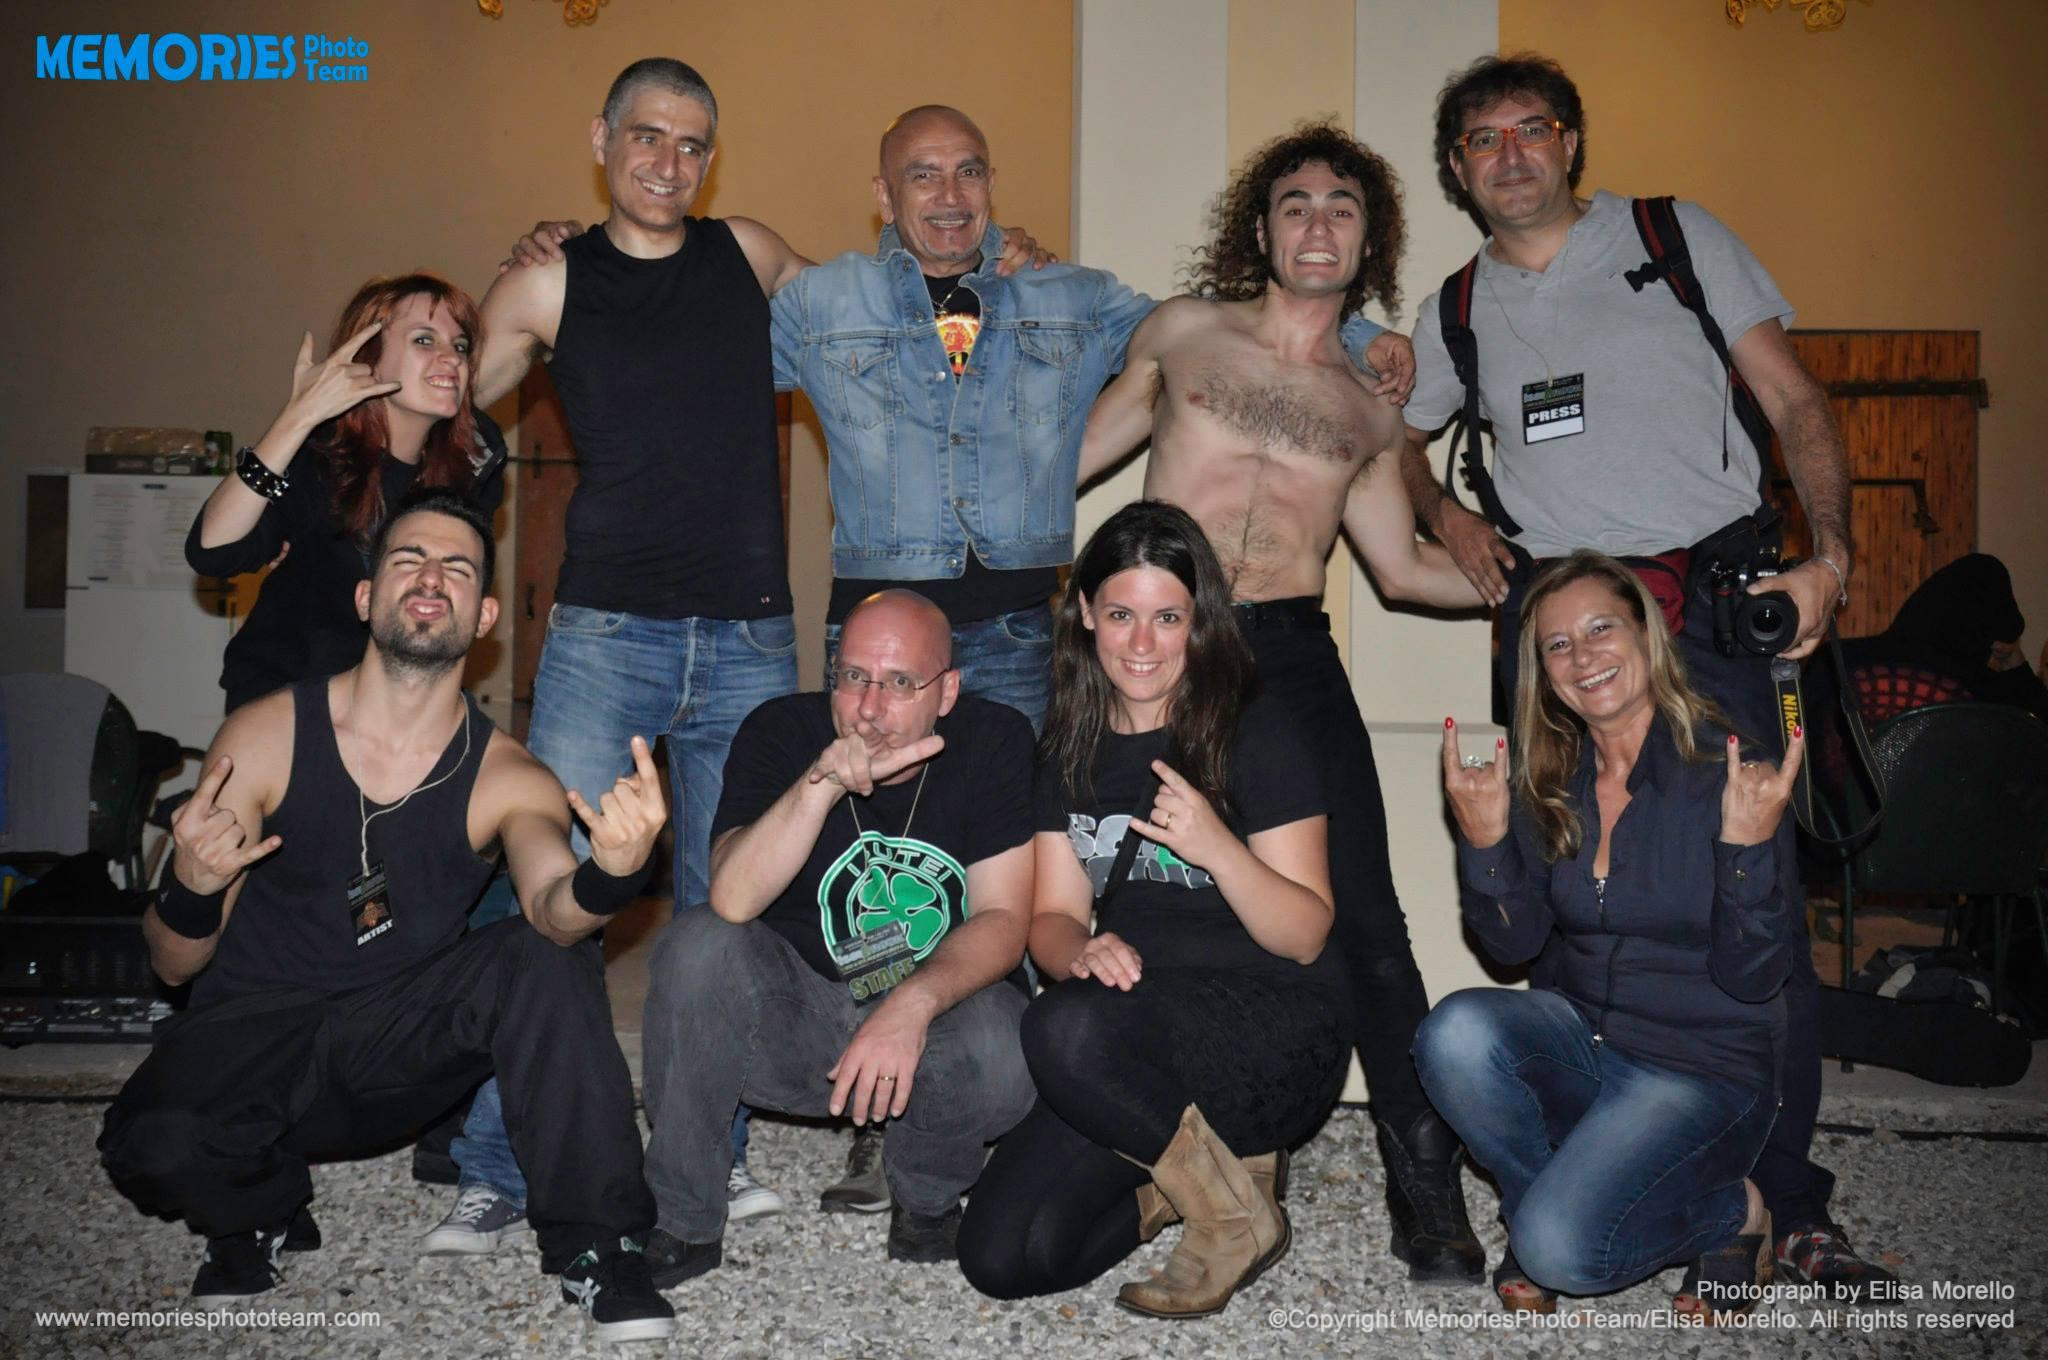 With IsolaRock Festival fans